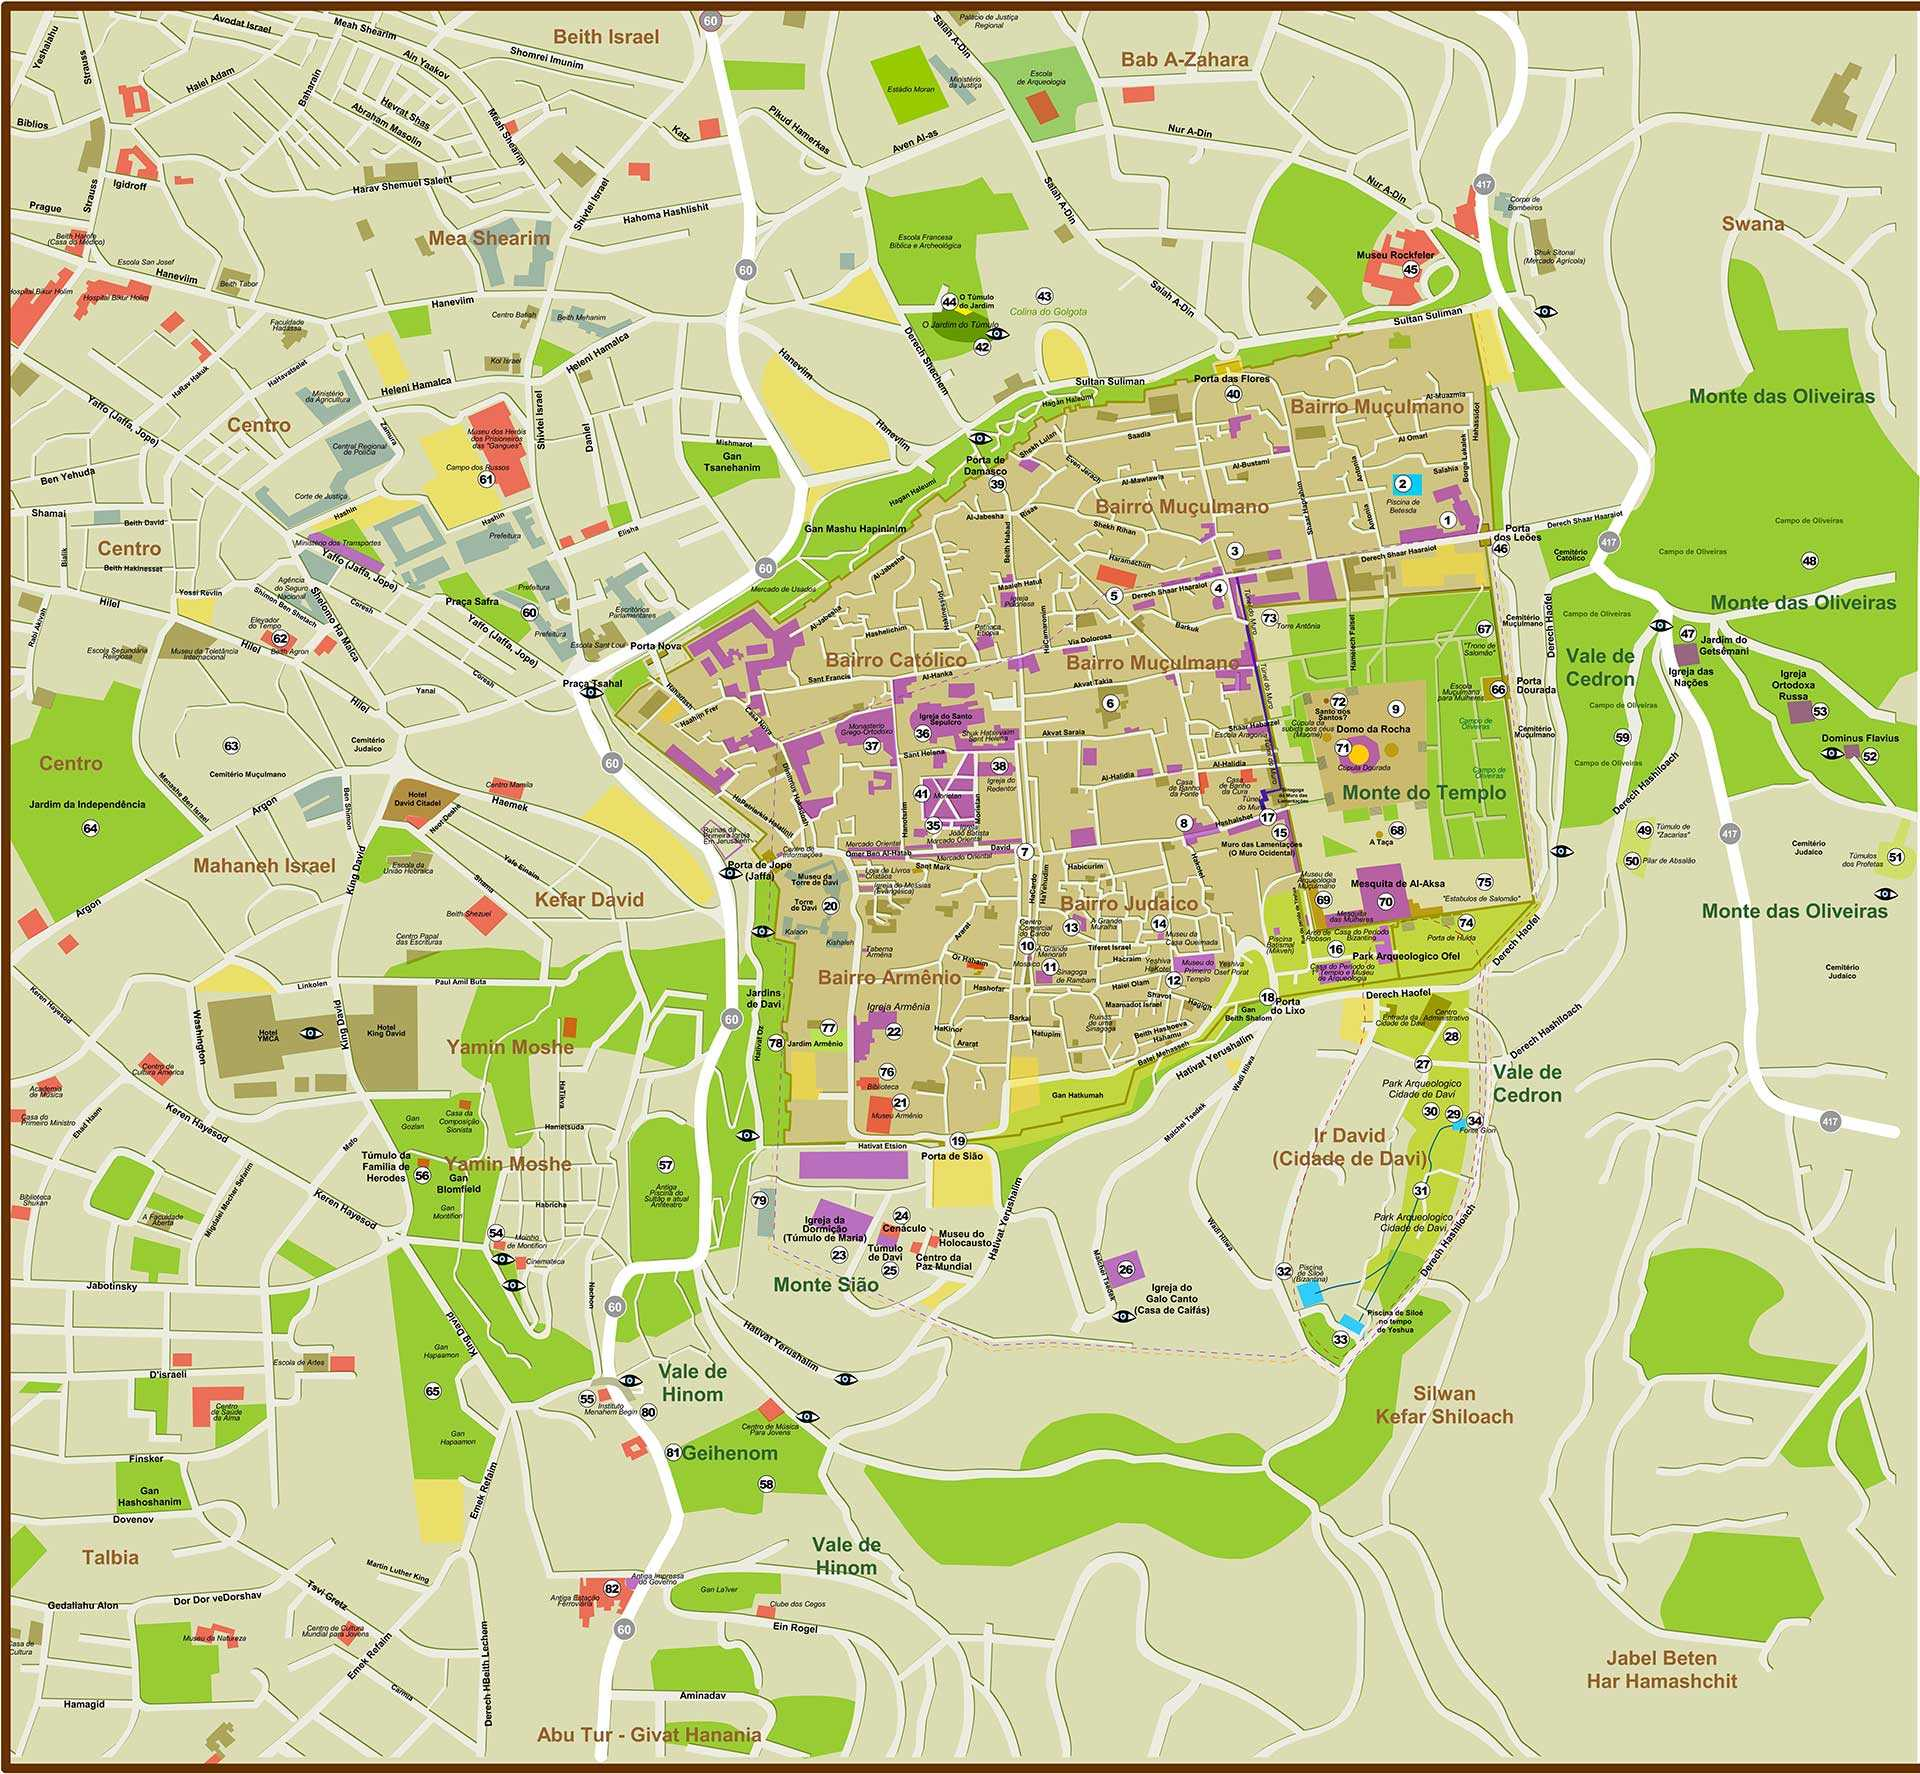 Grande Mapa De Jerusalem Para Impressao Noticias De Israel